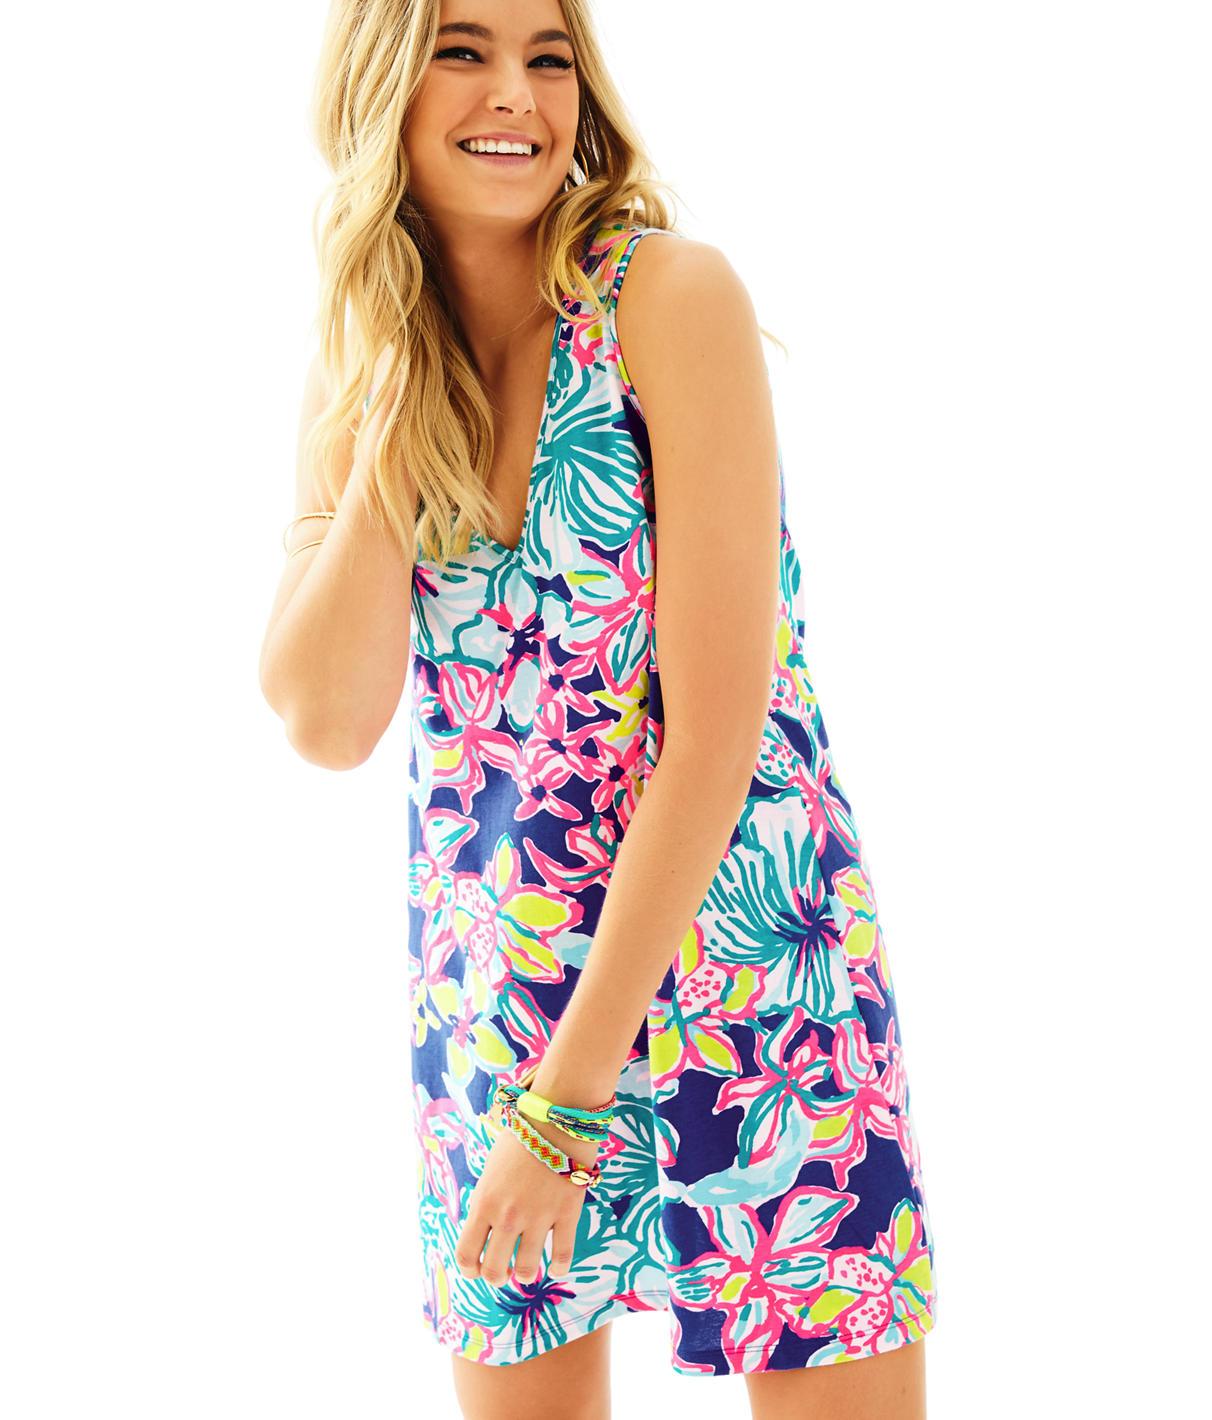 Lilly Pulitzer Blythe V-Neck Swing Dress